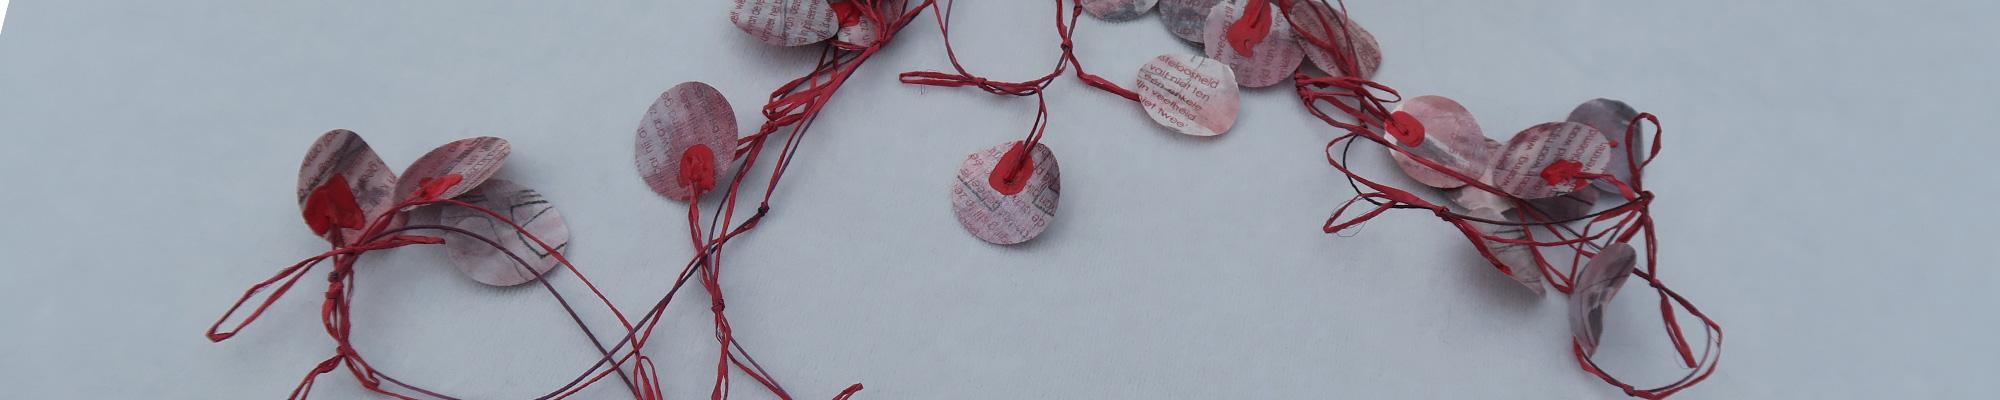 ketting van rubber en rijstpapier waarin tekst is gedruks © 20?? Anne-Riet de Boer